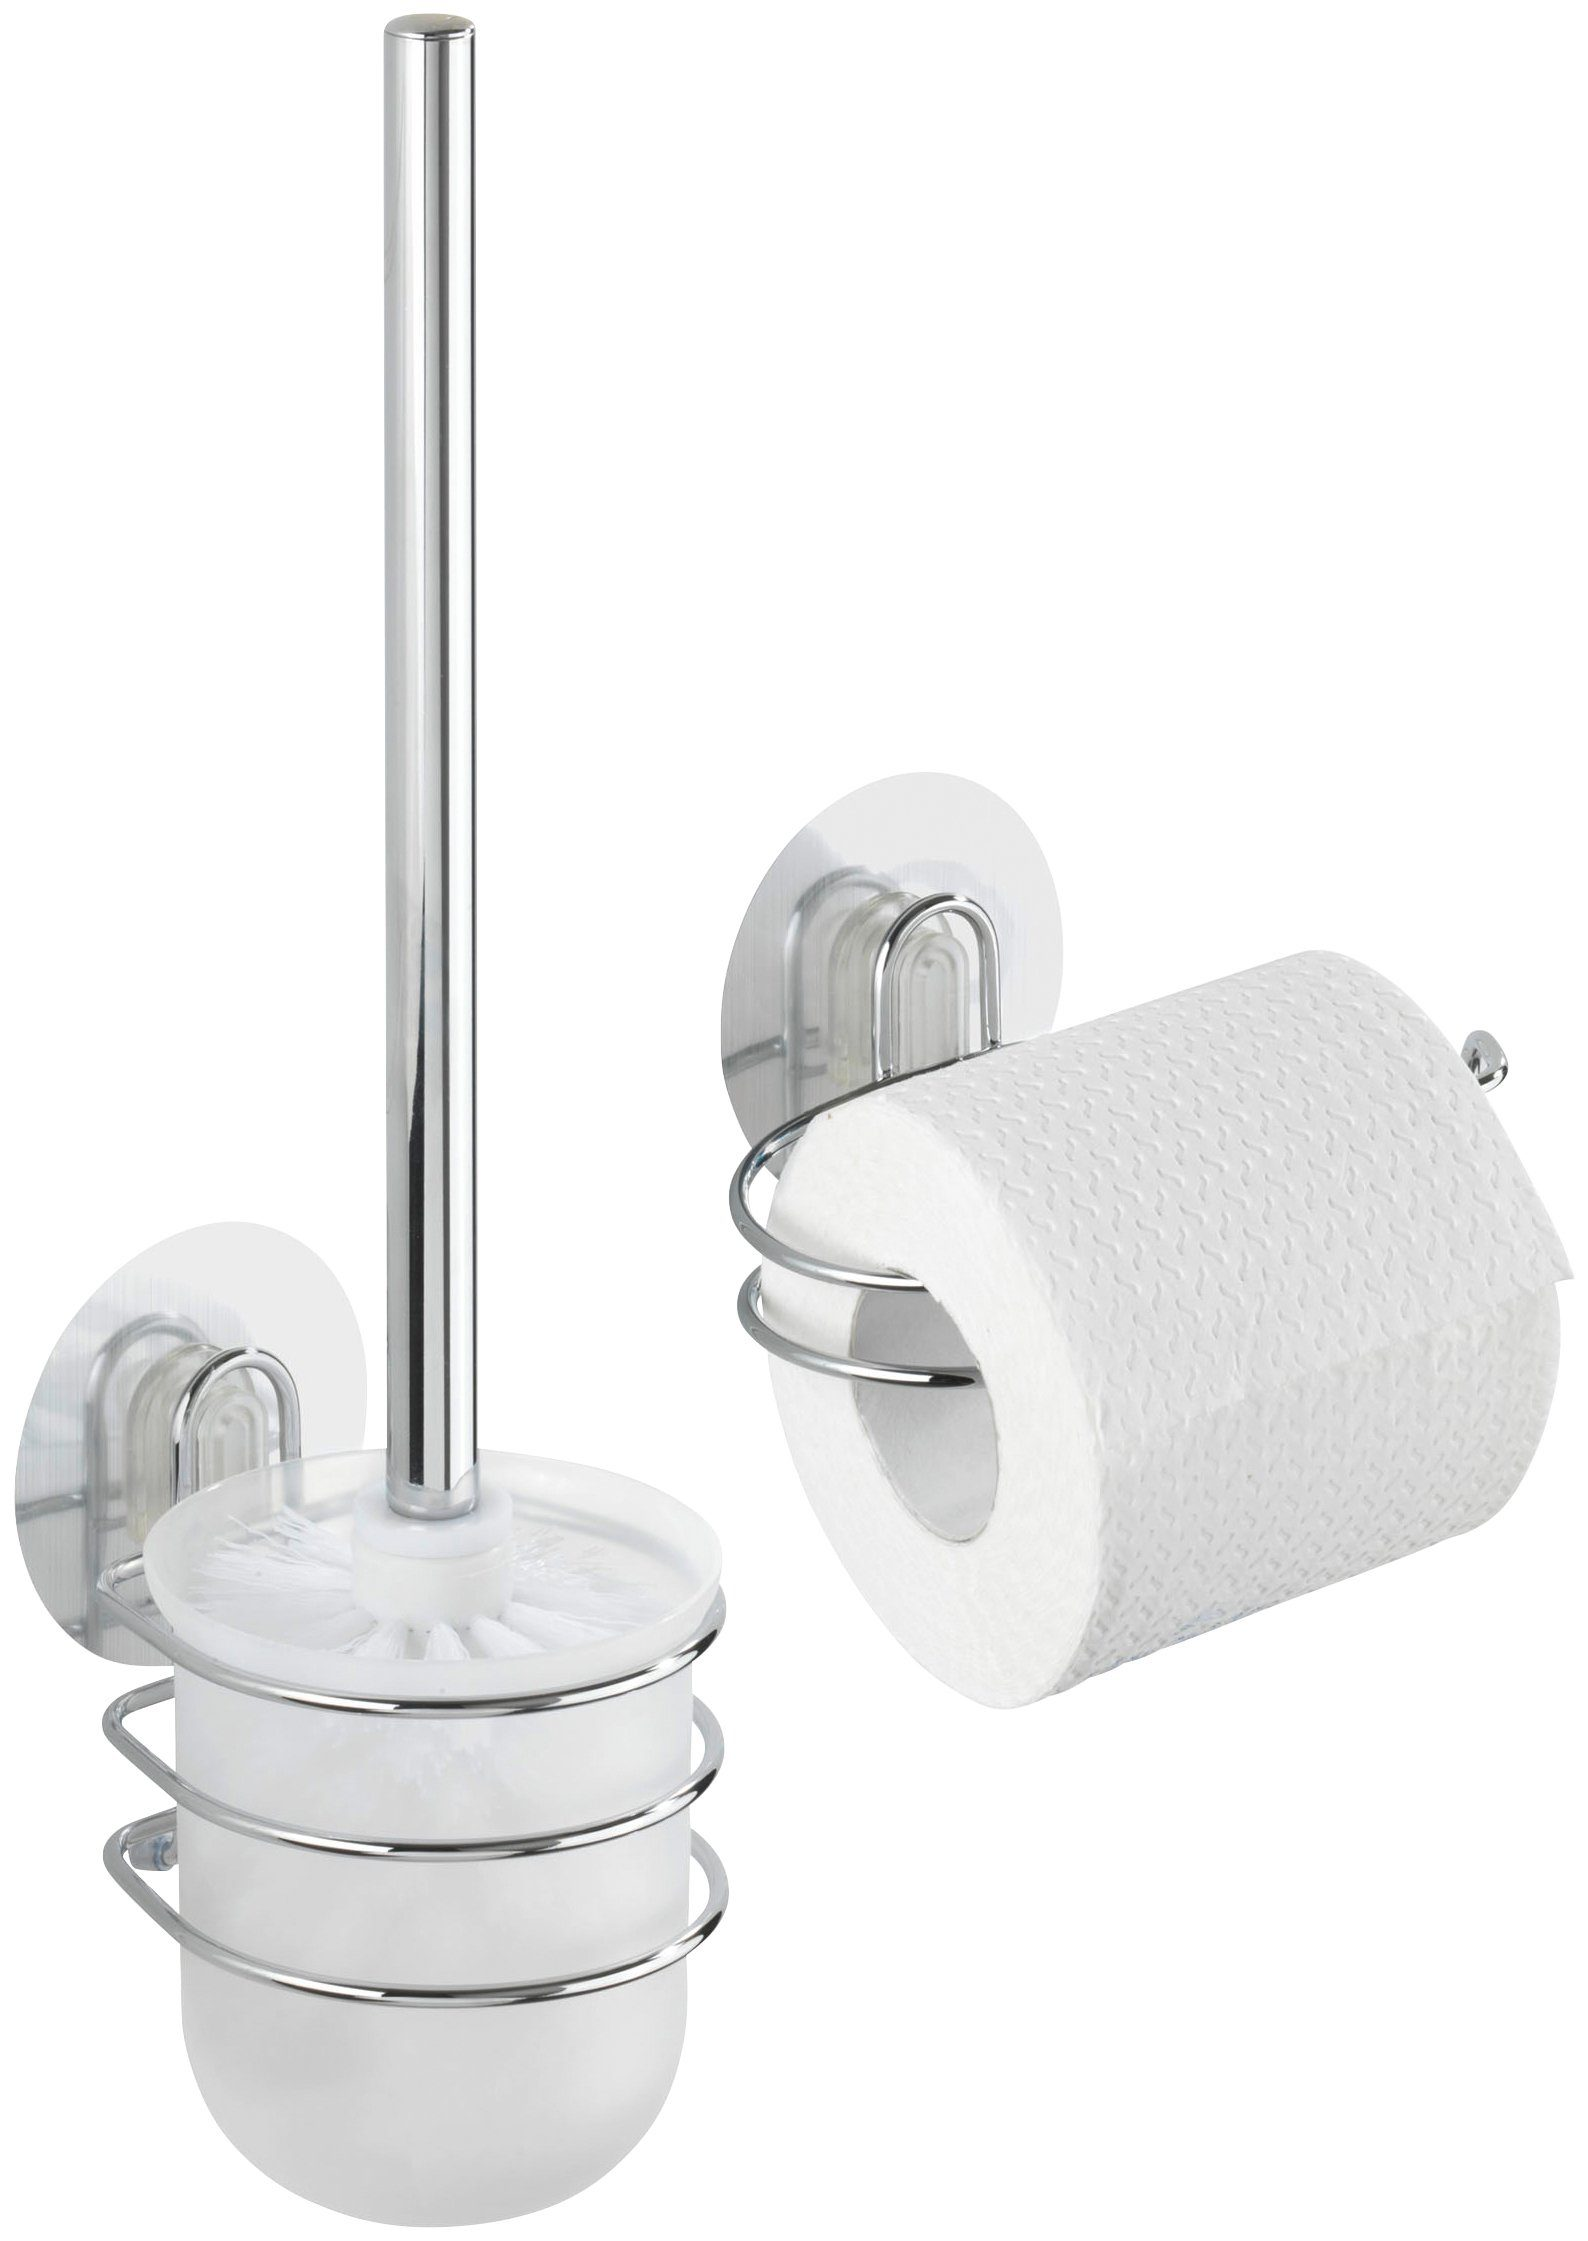 WENKO WC-Garnitur »Osimo«, WC-Rollenhalter, 2-teiliges Set, Static-Loc